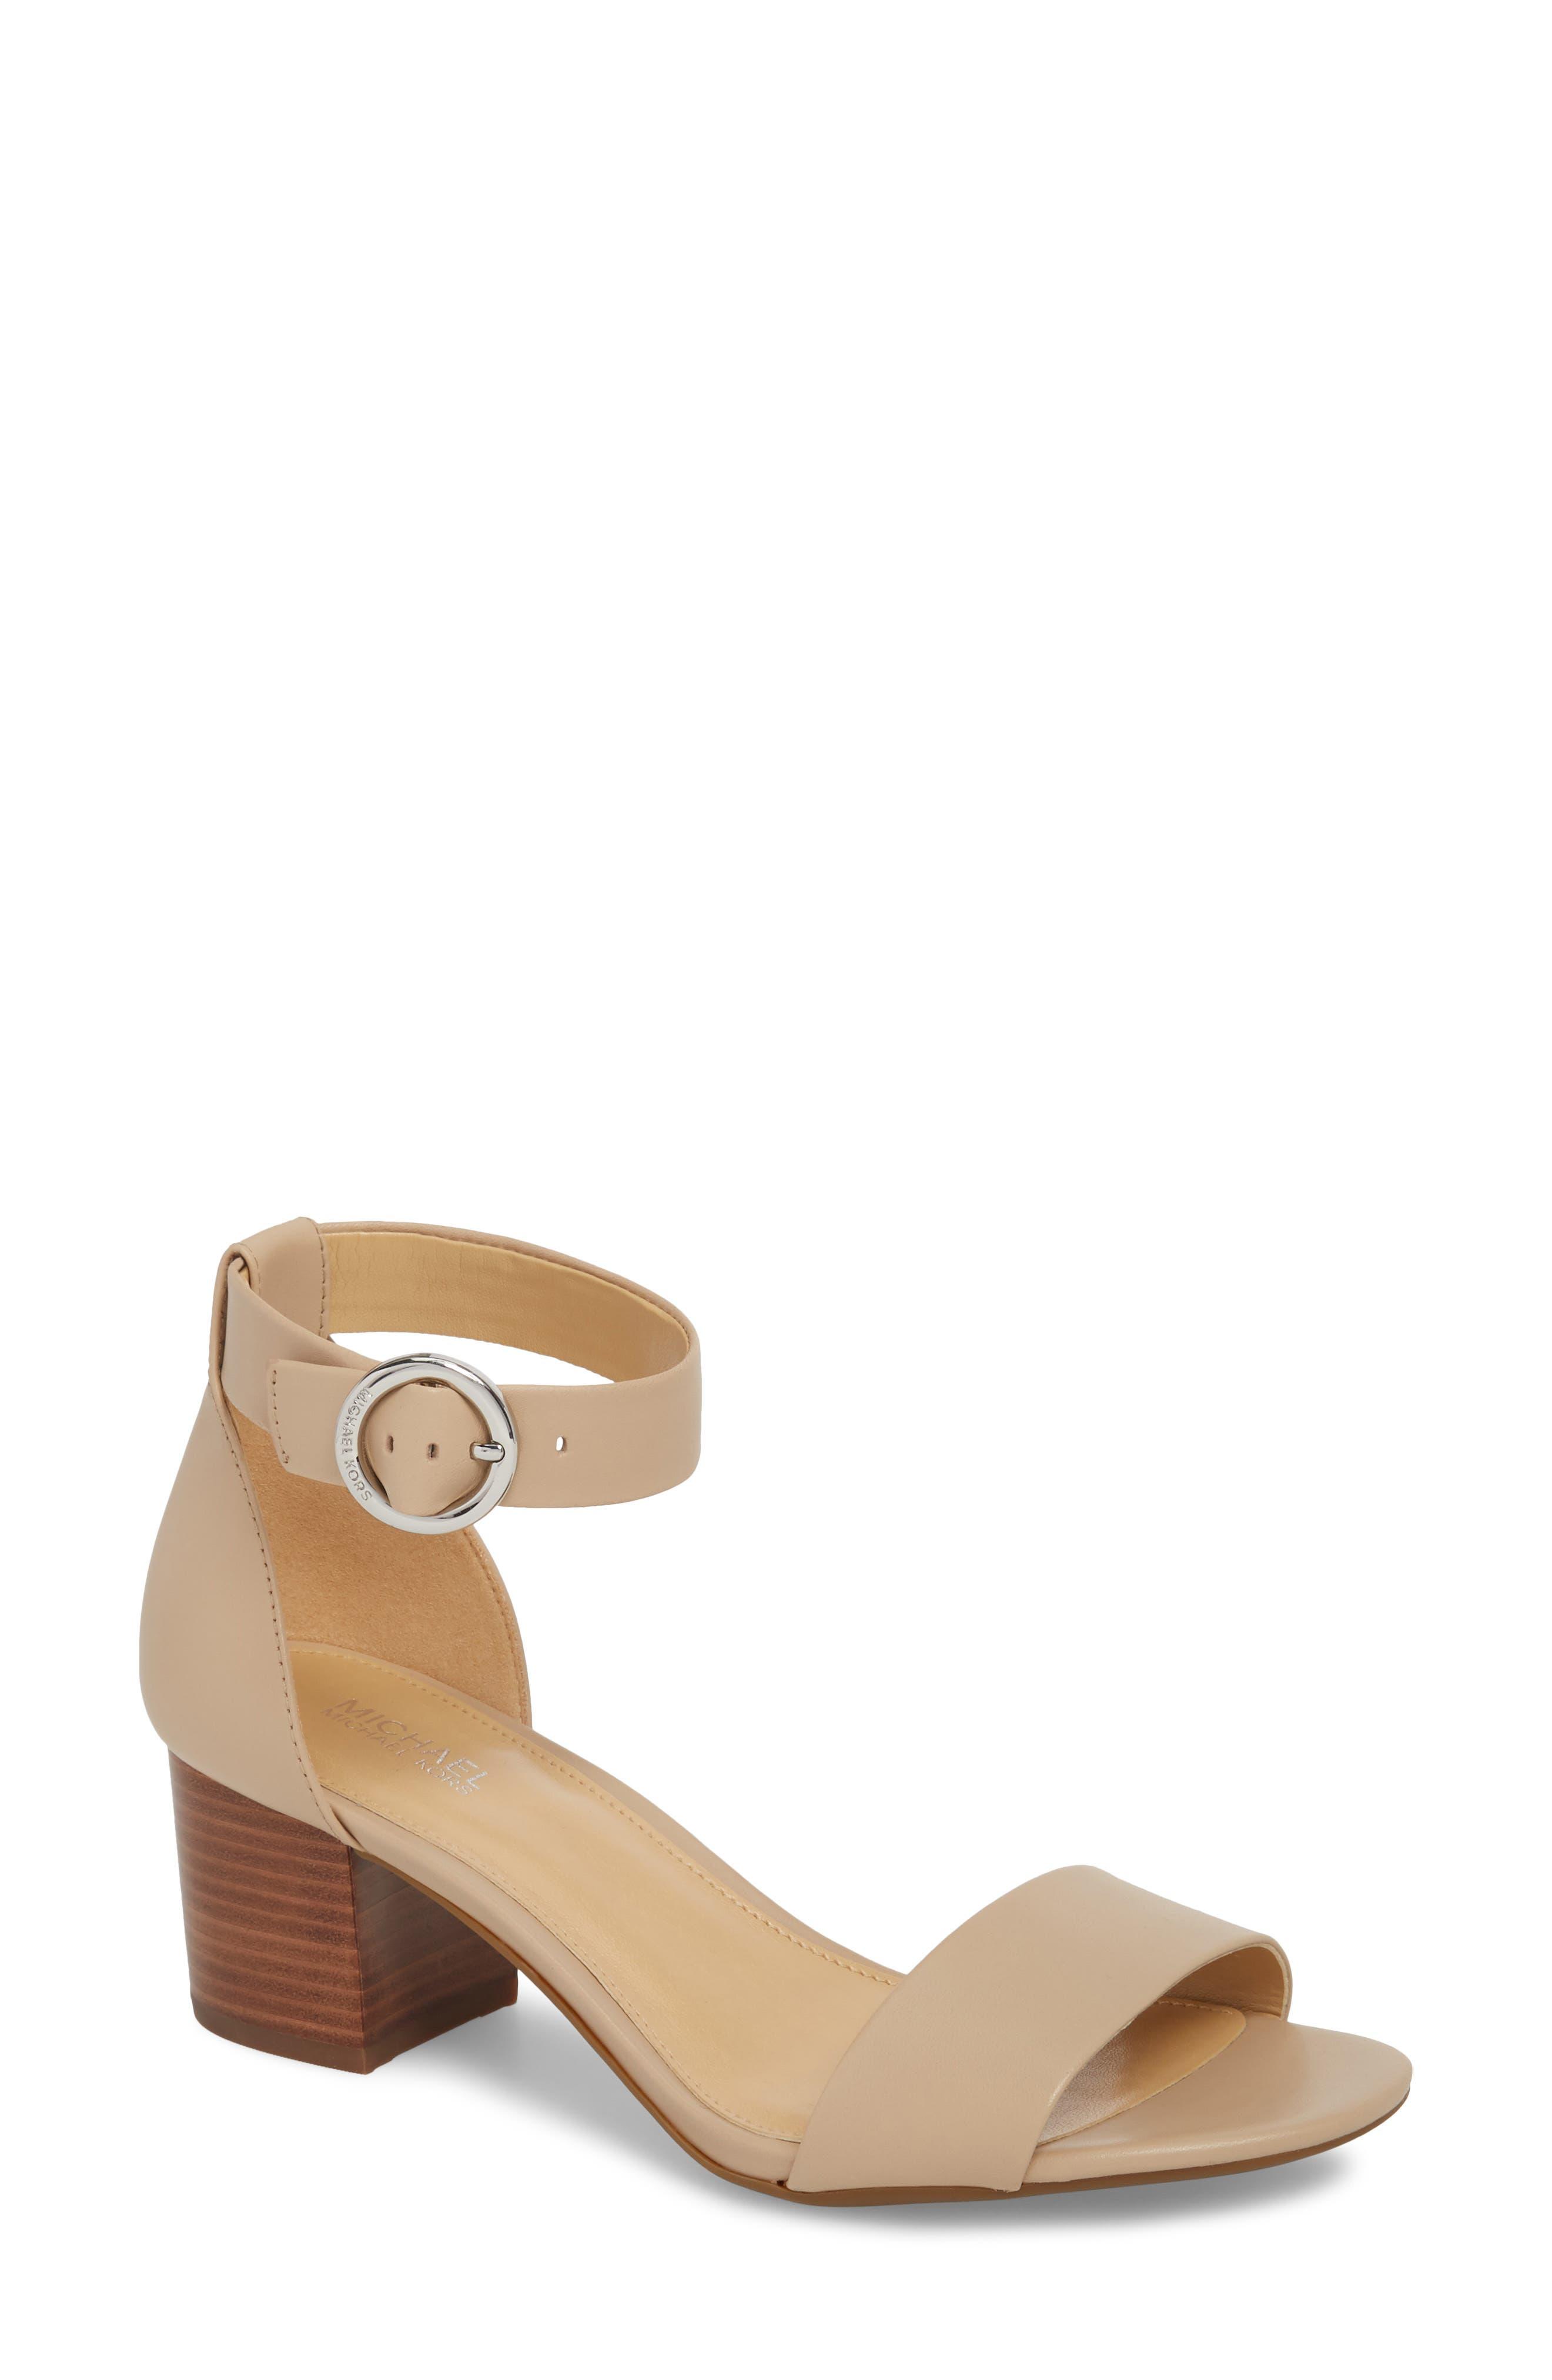 Lena Block Heel Sandal,                         Main,                         color, Bisque